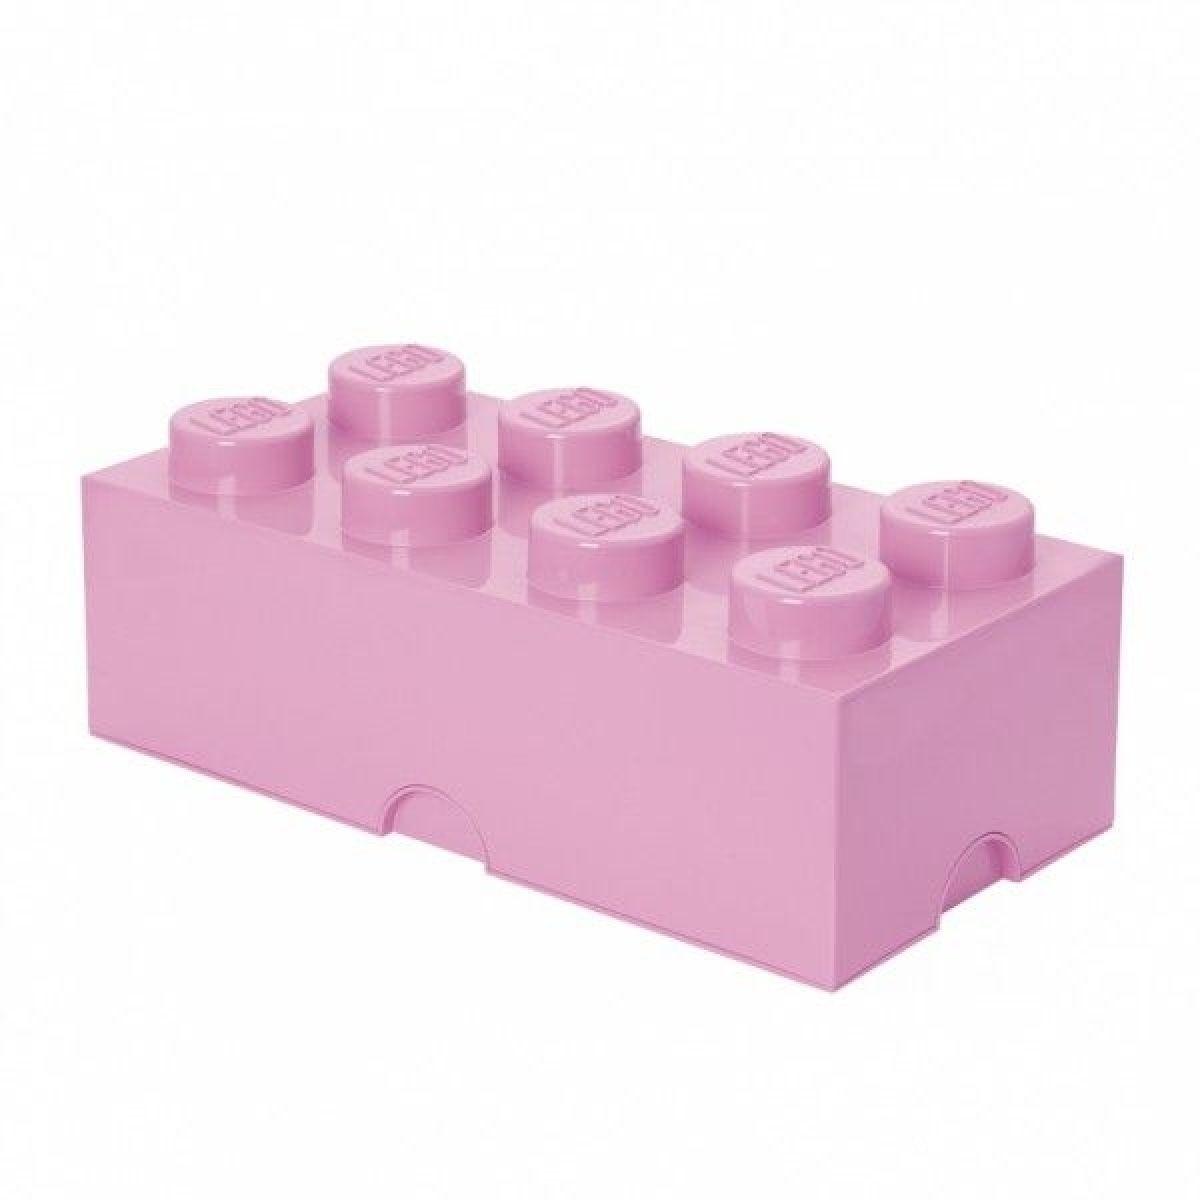 LEGO Úložný box 25 x 50 x 18 cm Světle růžová